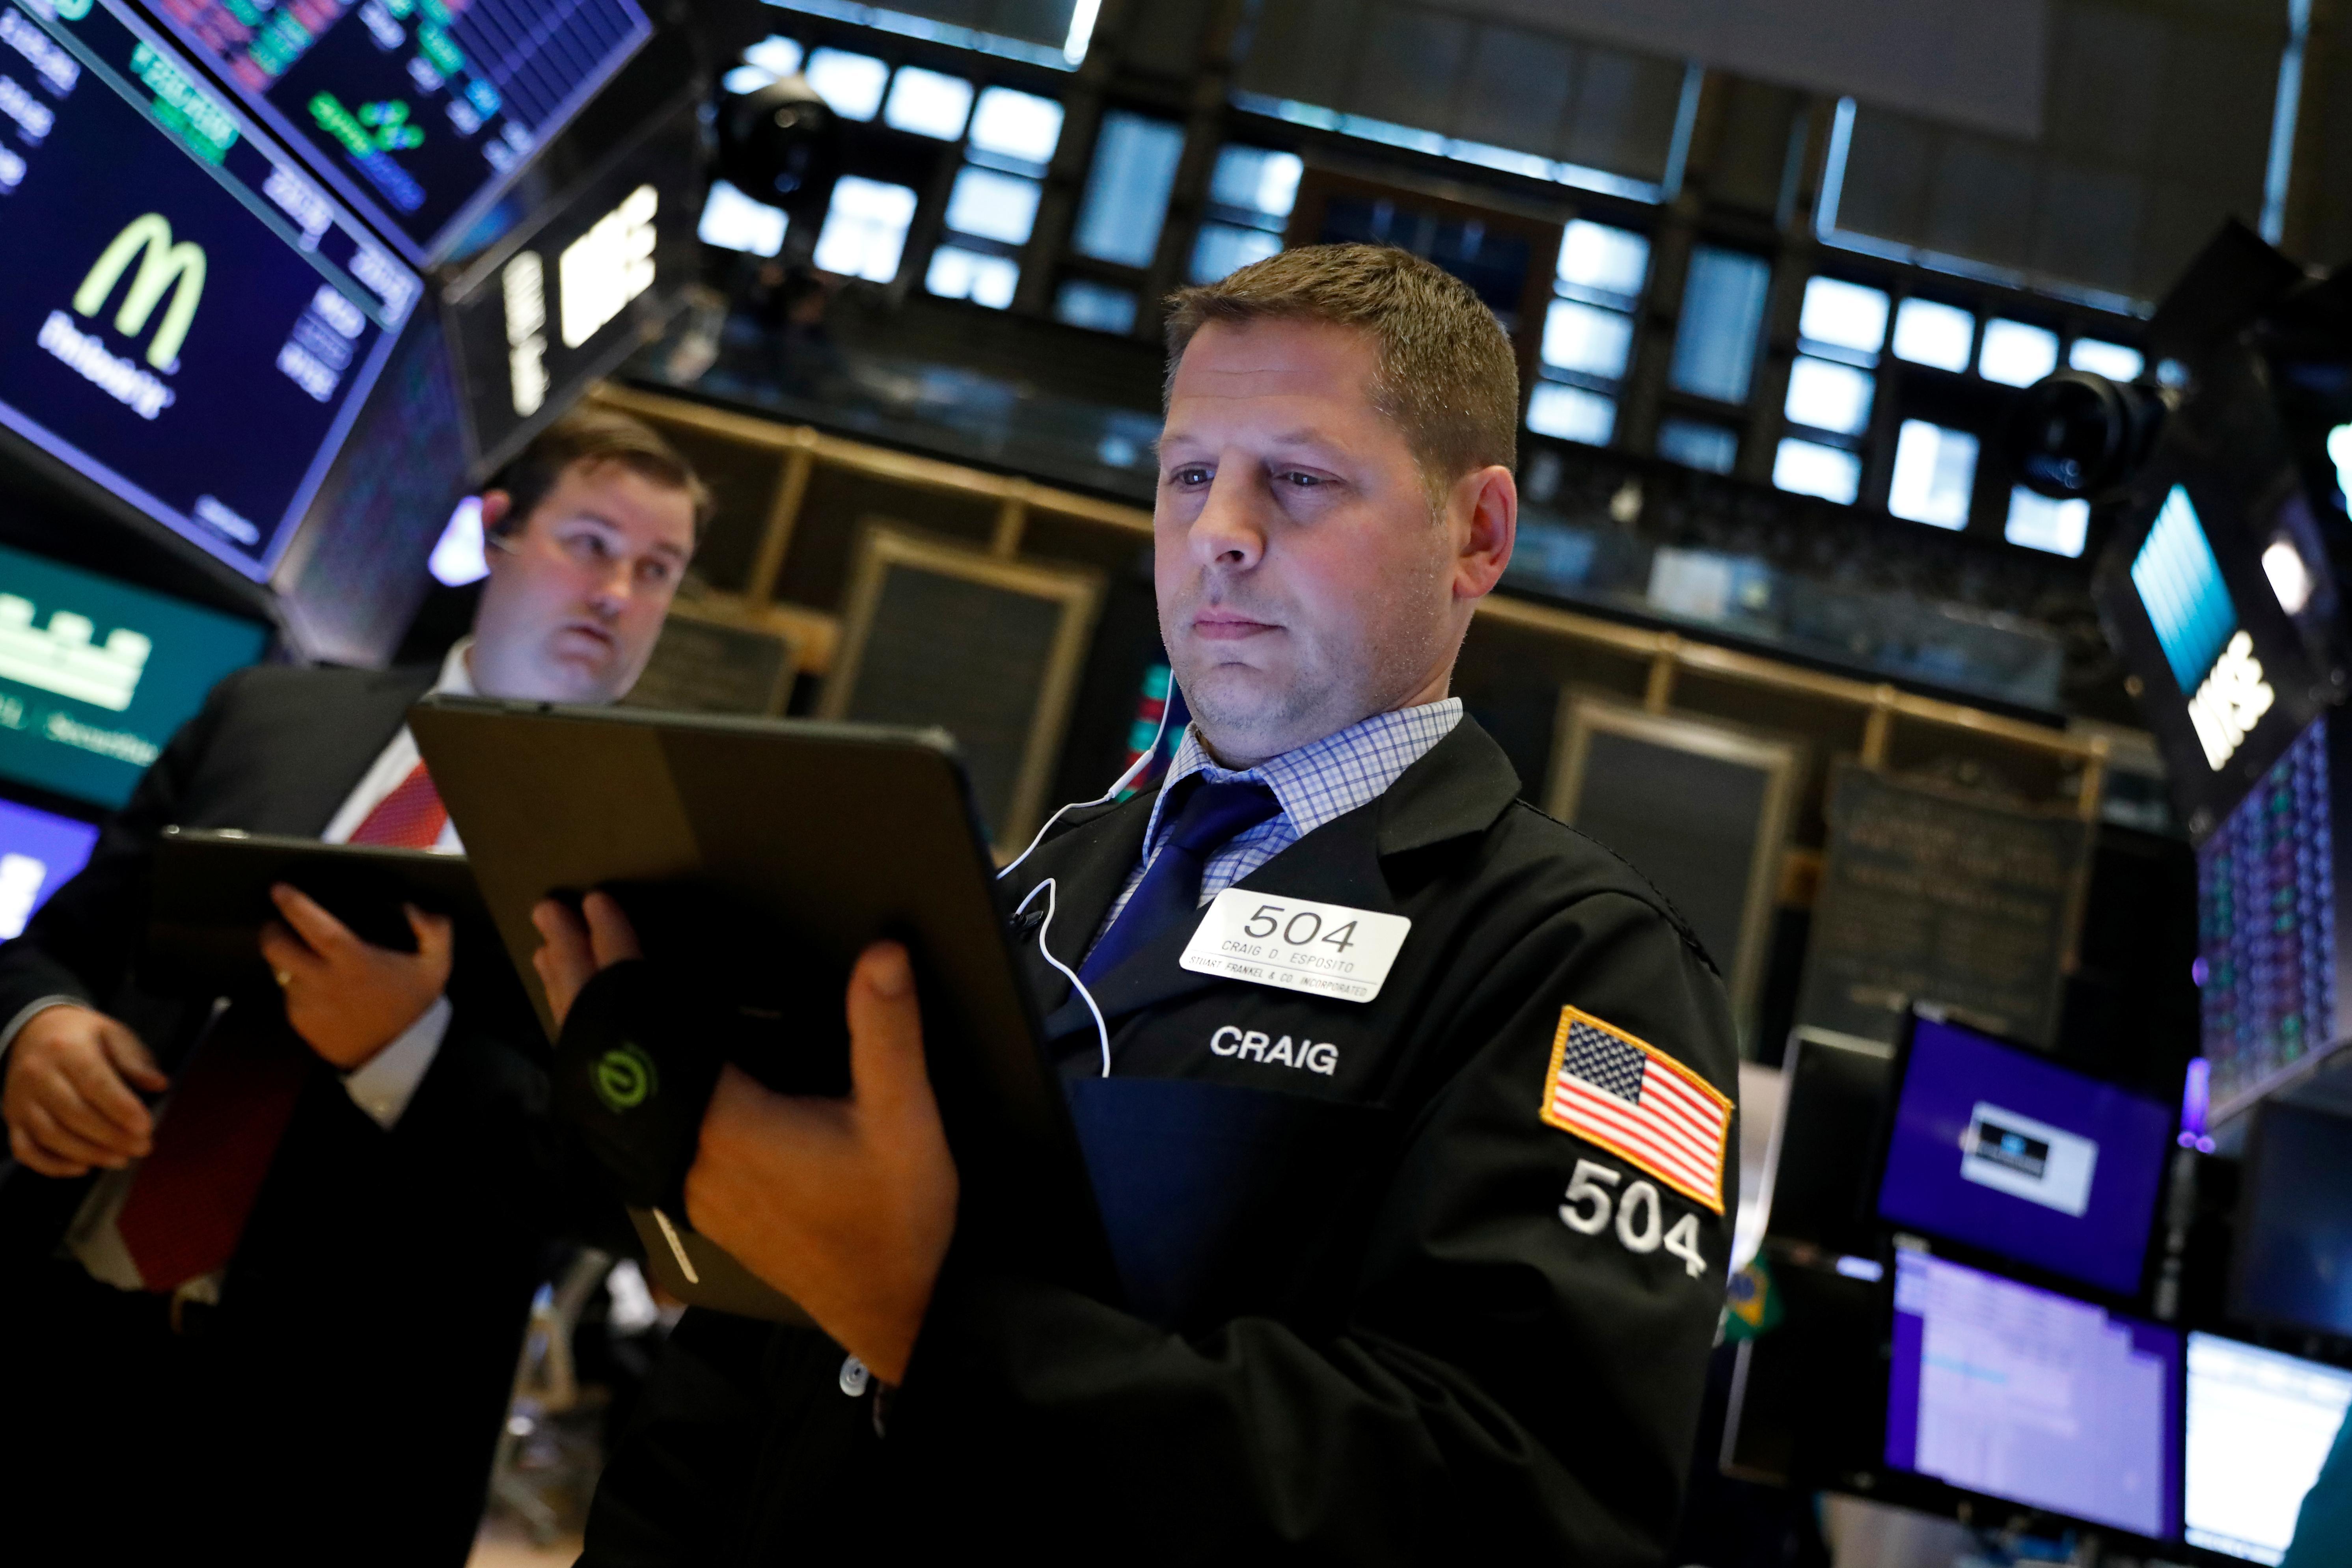 Wall Street slips as weak economic data offsets earnings strength